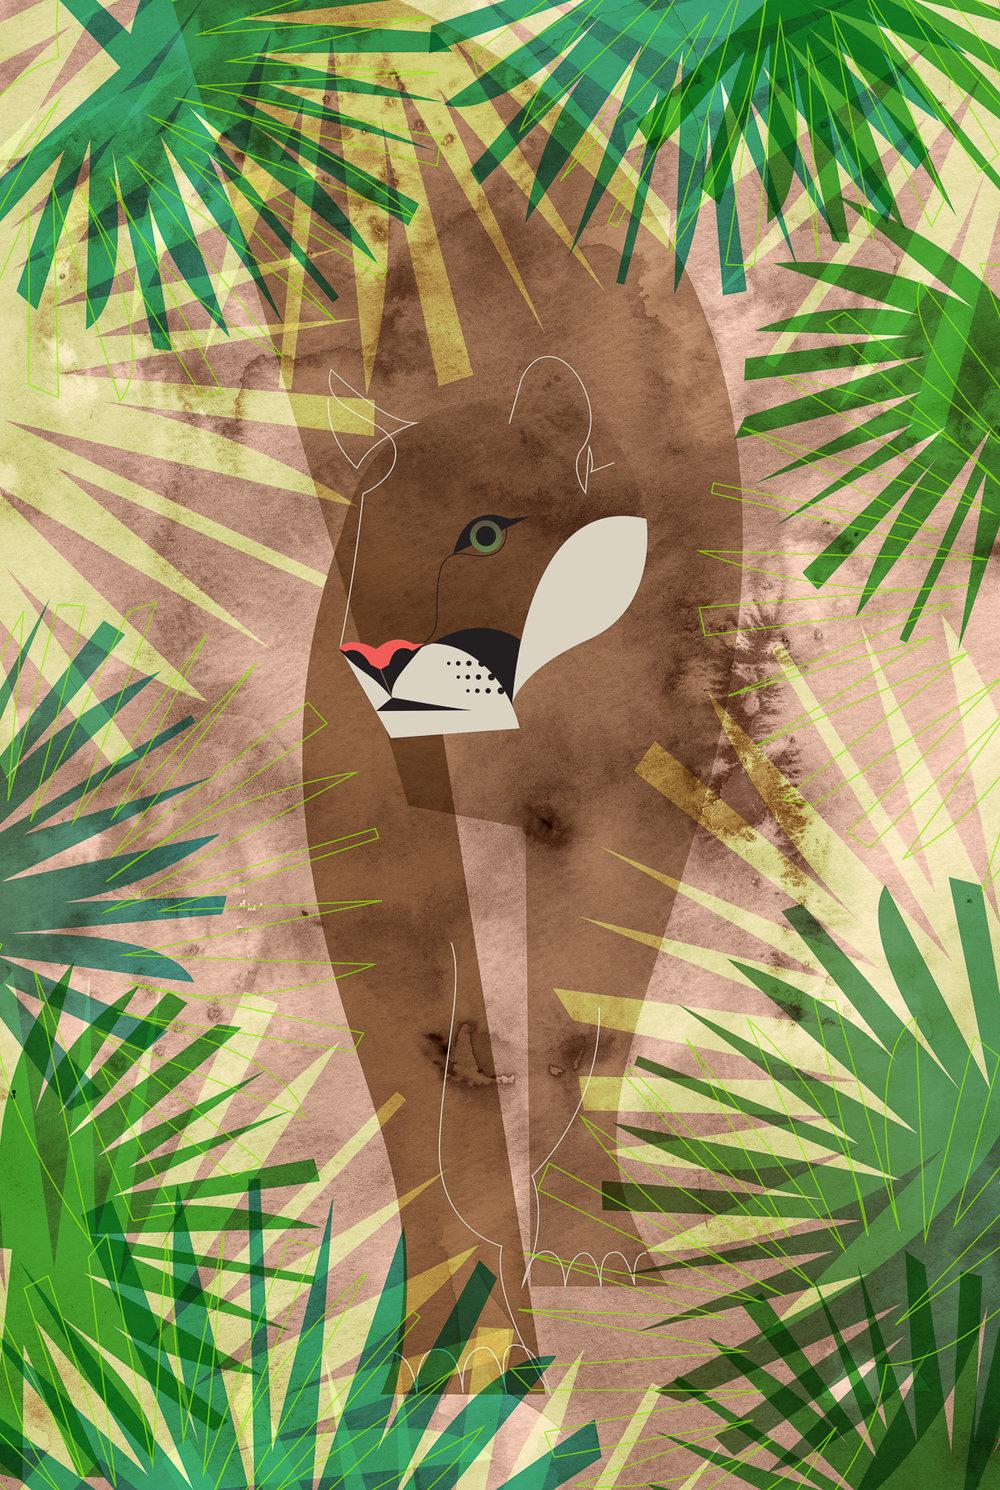 SOI 57 2014 - ARTIST: Eleanor GroschTITLE: Florida [1 of 3]